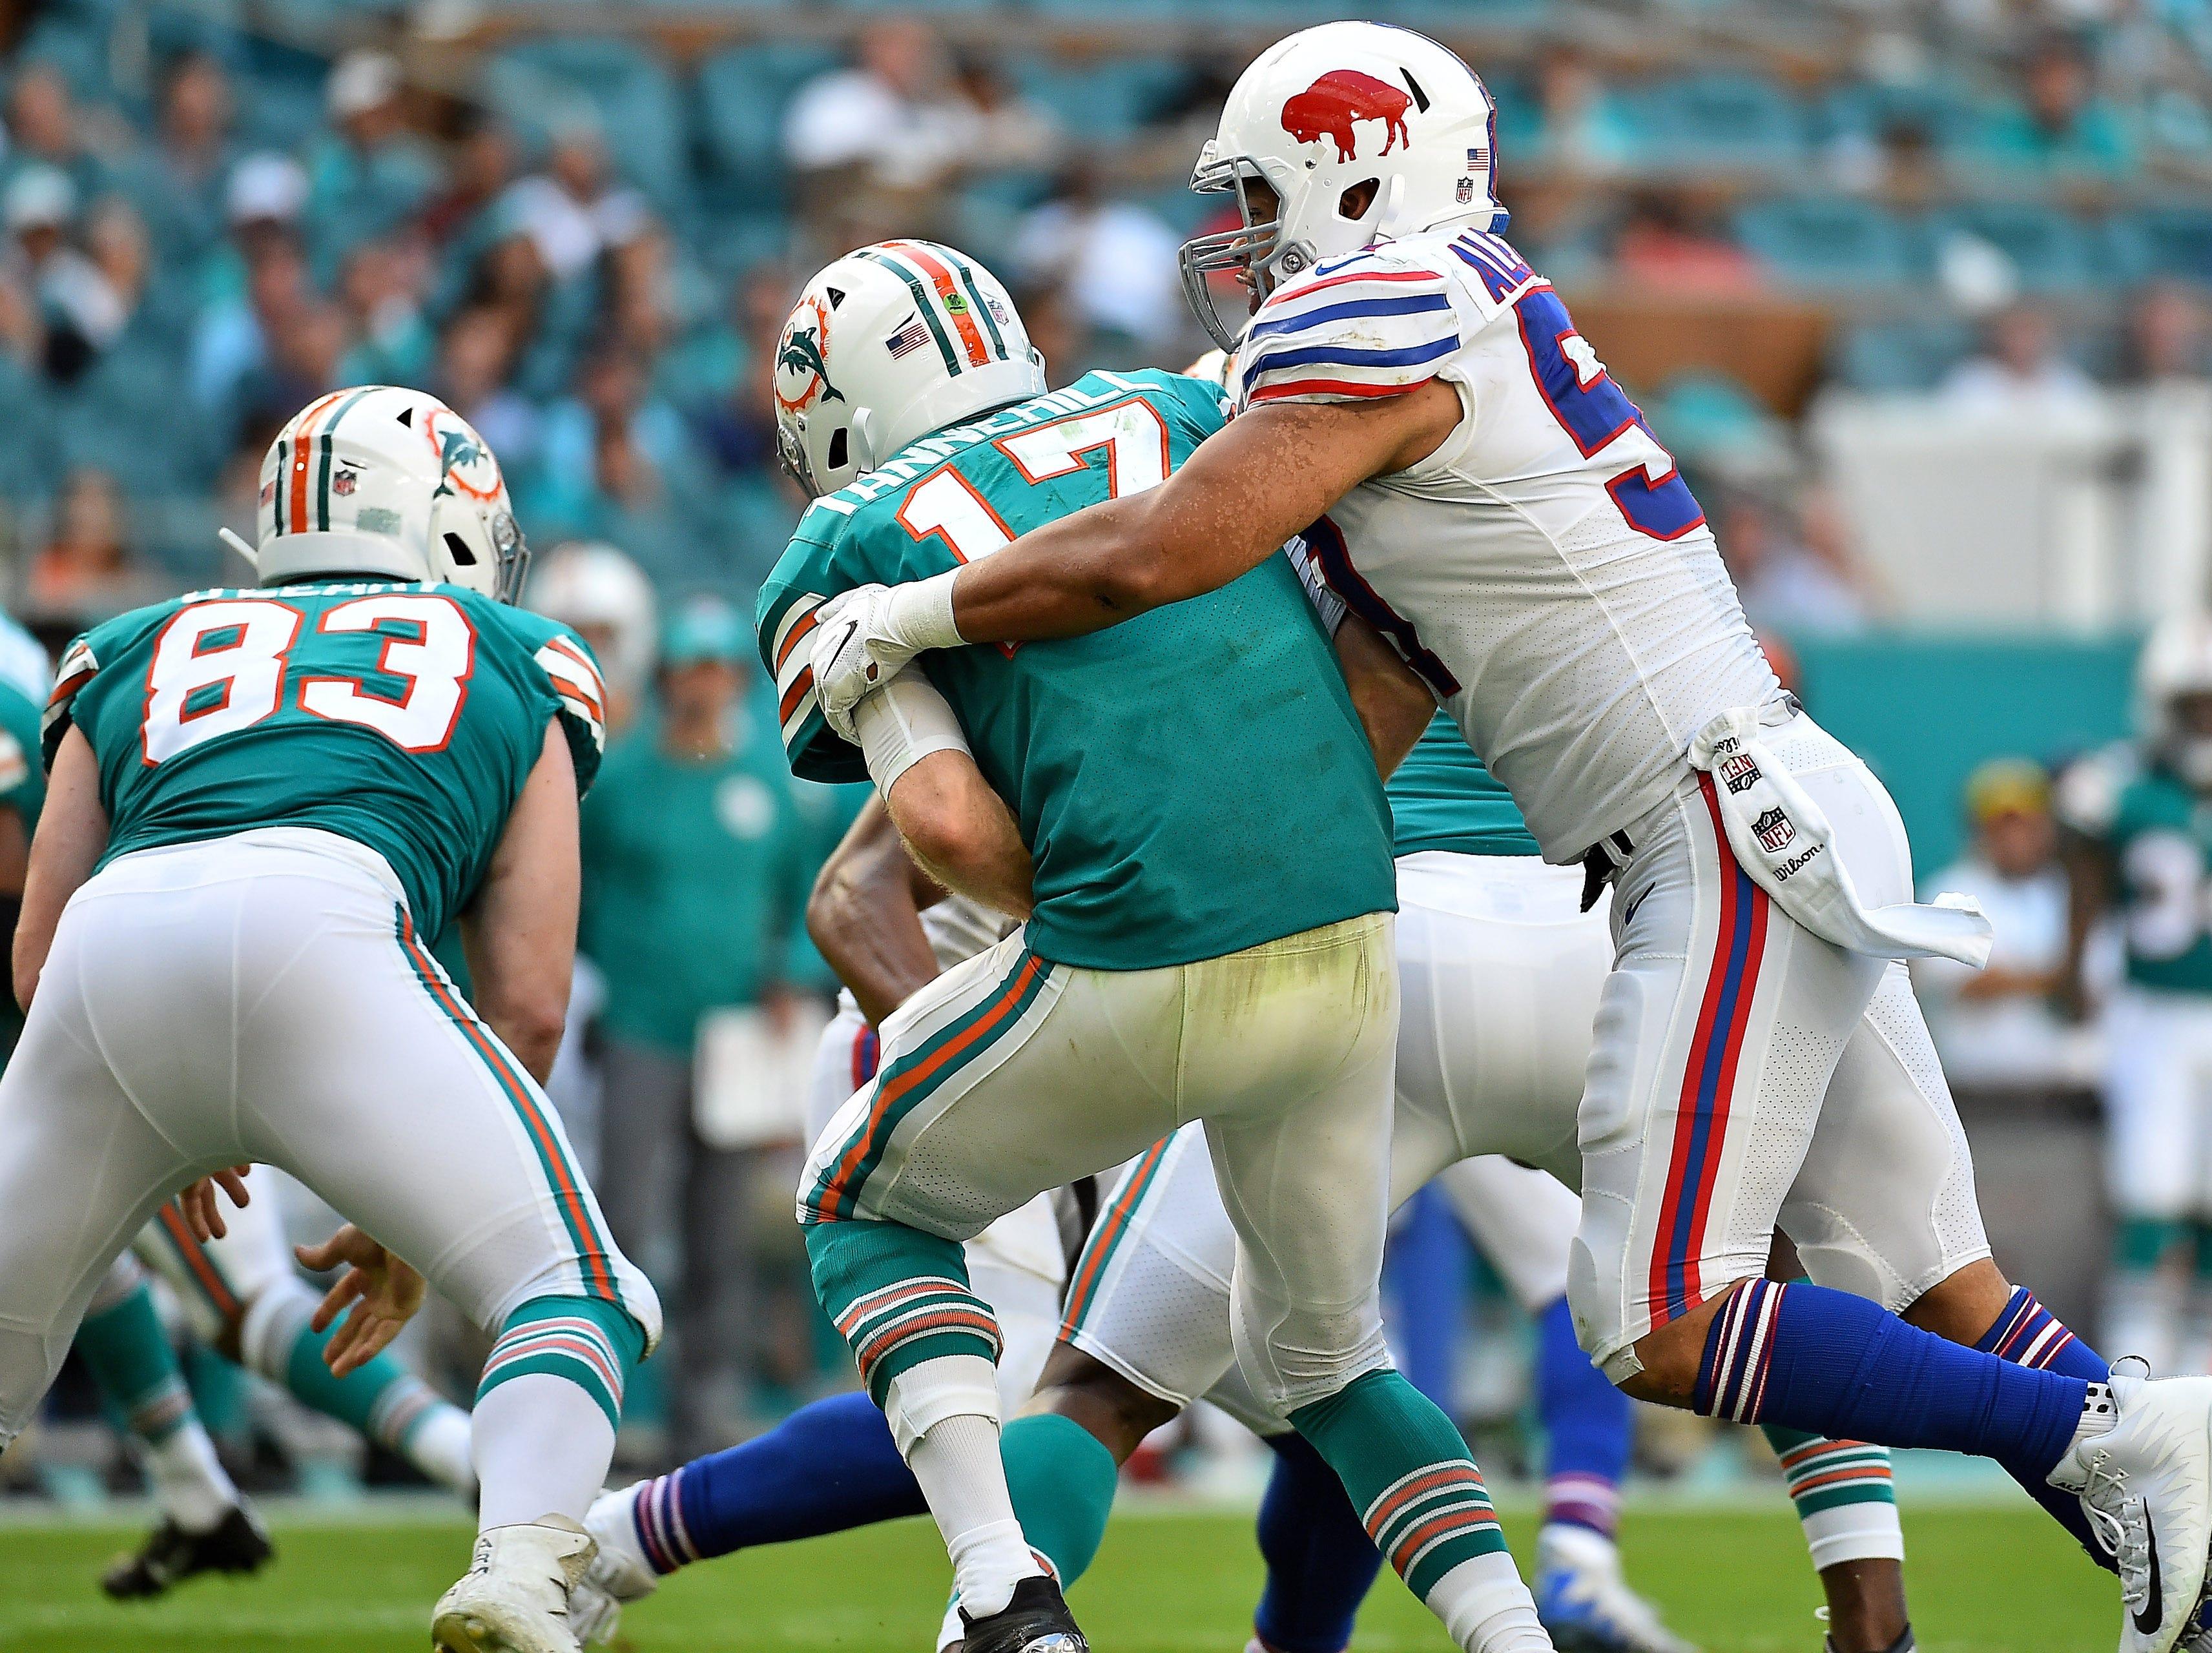 Buffalo Bills outside linebacker Lorenzo Alexander (57) sacks Miami Dolphins quarterback Ryan Tannehill (17) during the first half at Hard Rock Stadium. Mandatory Credit: Jasen Vinlove-USA TODAY Sports